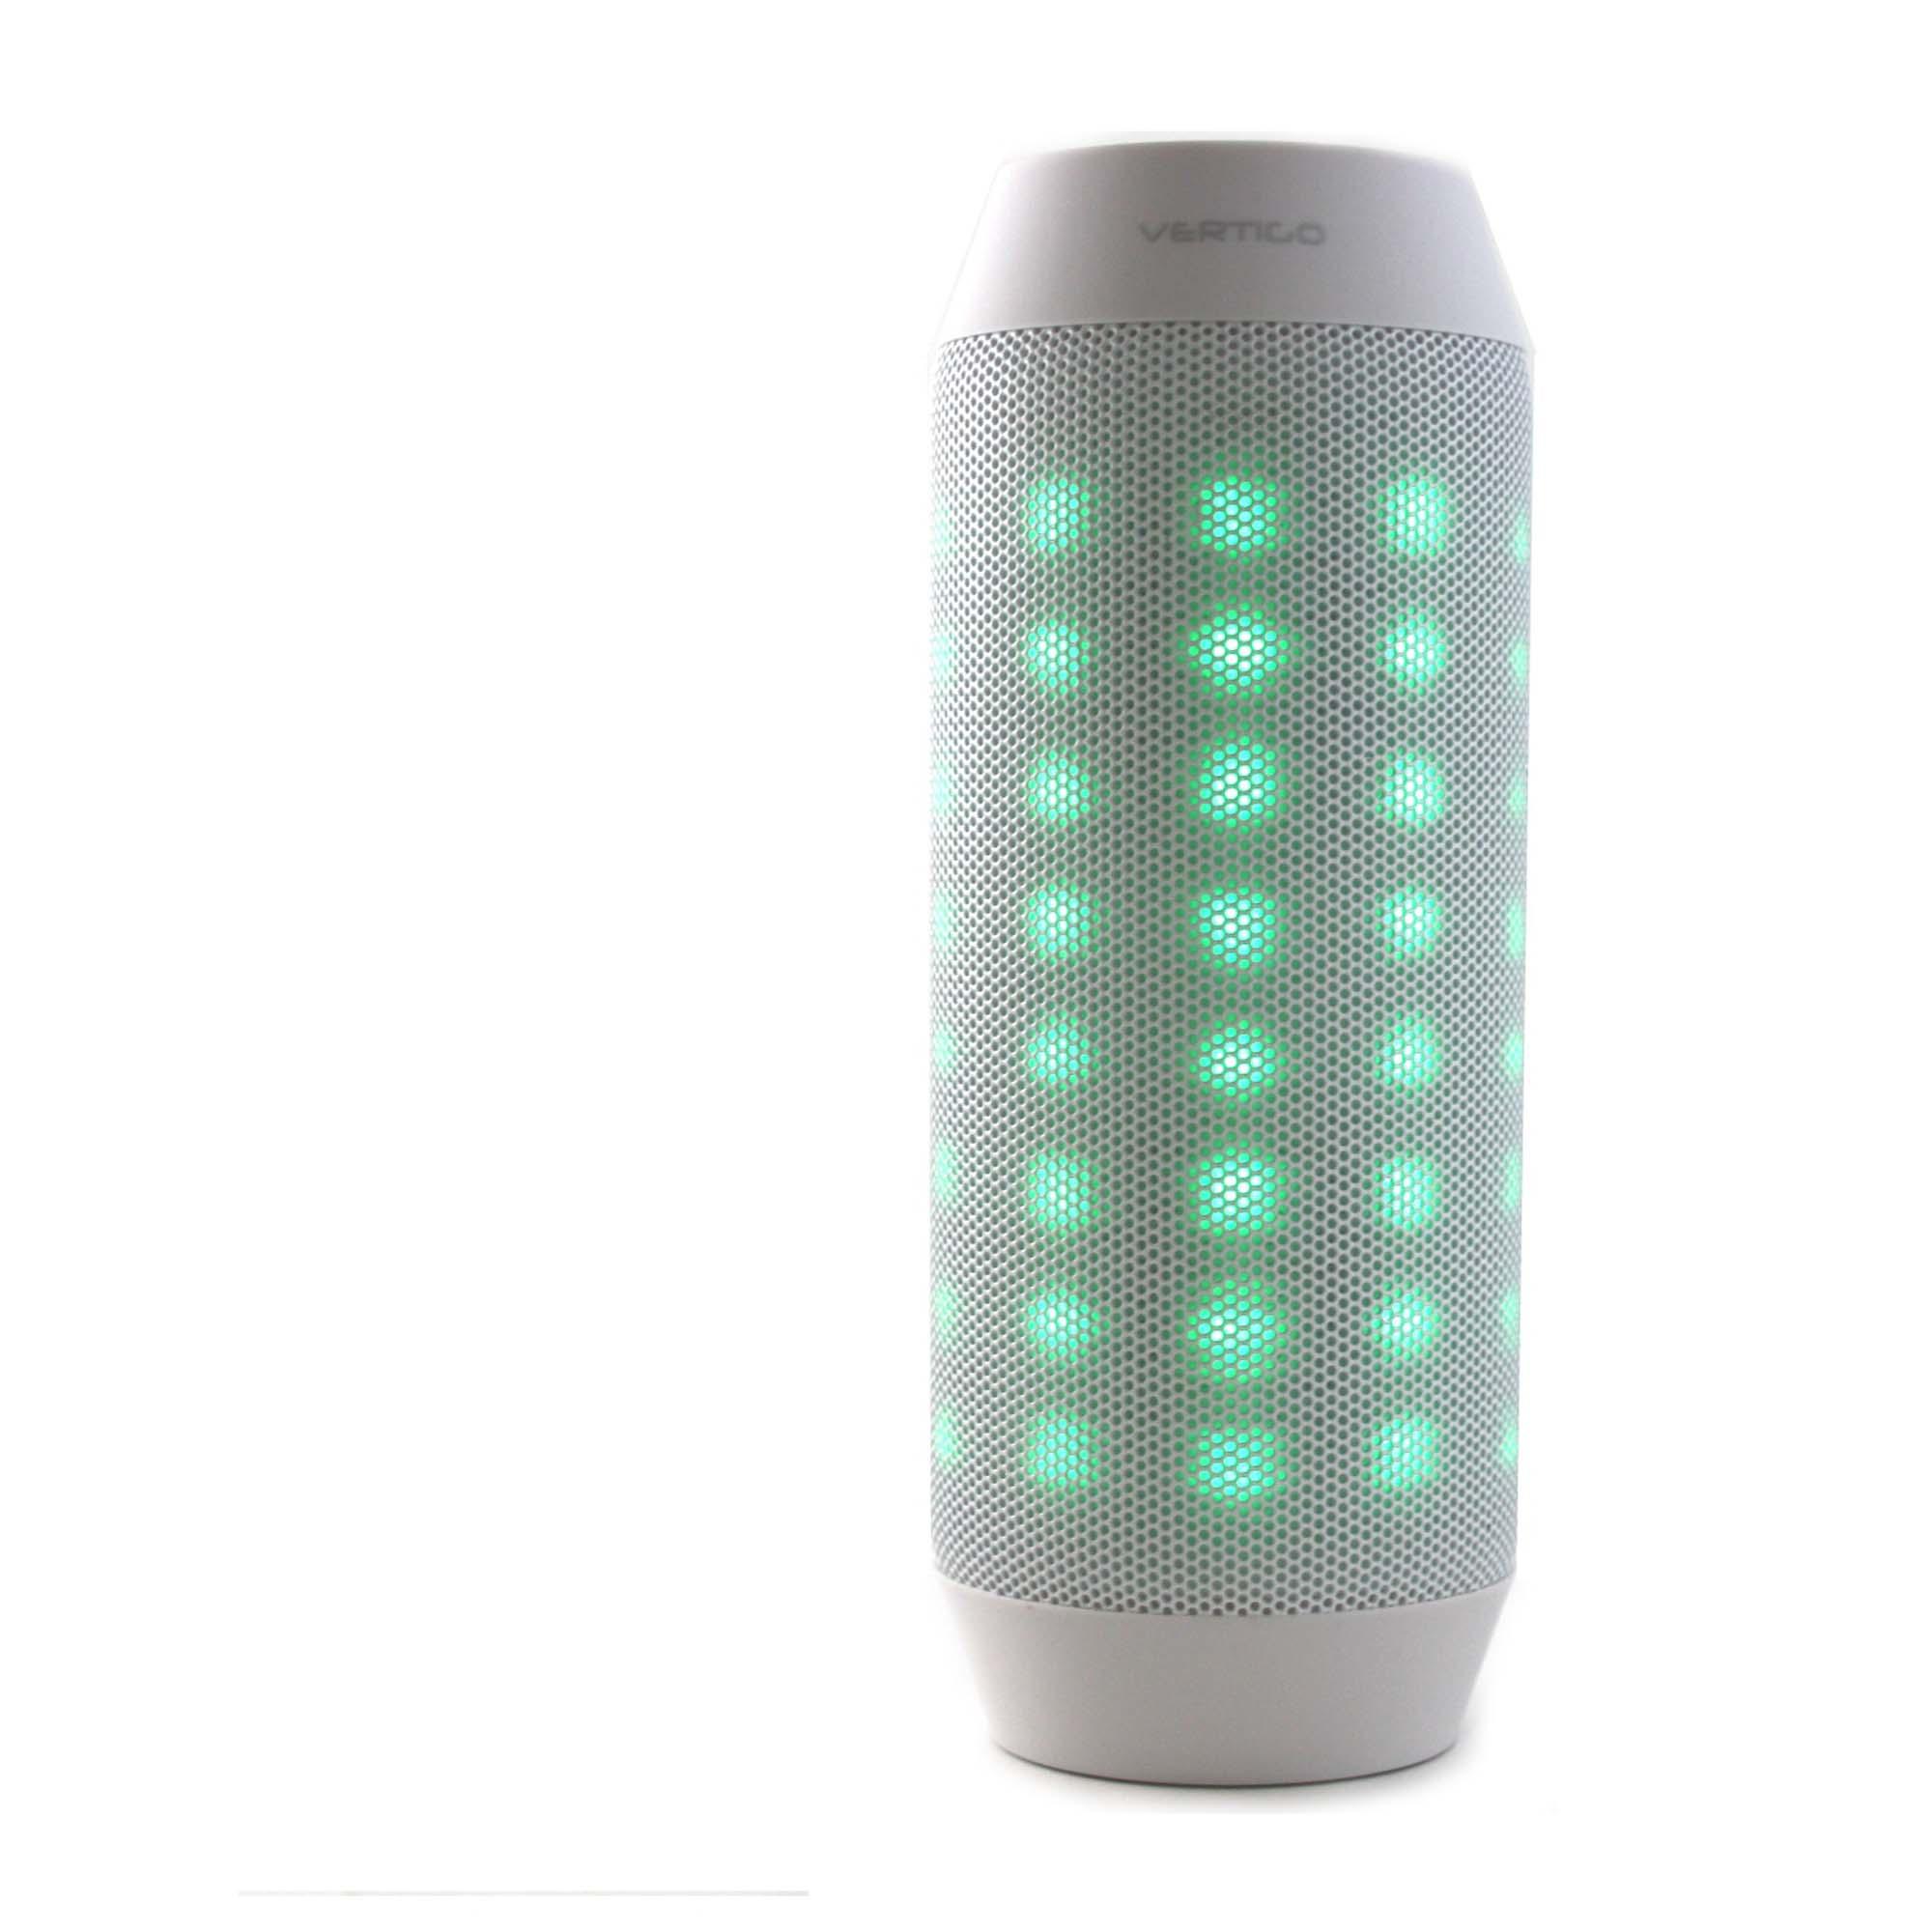 Vertigo Bluetooth LED Light Speaker - White